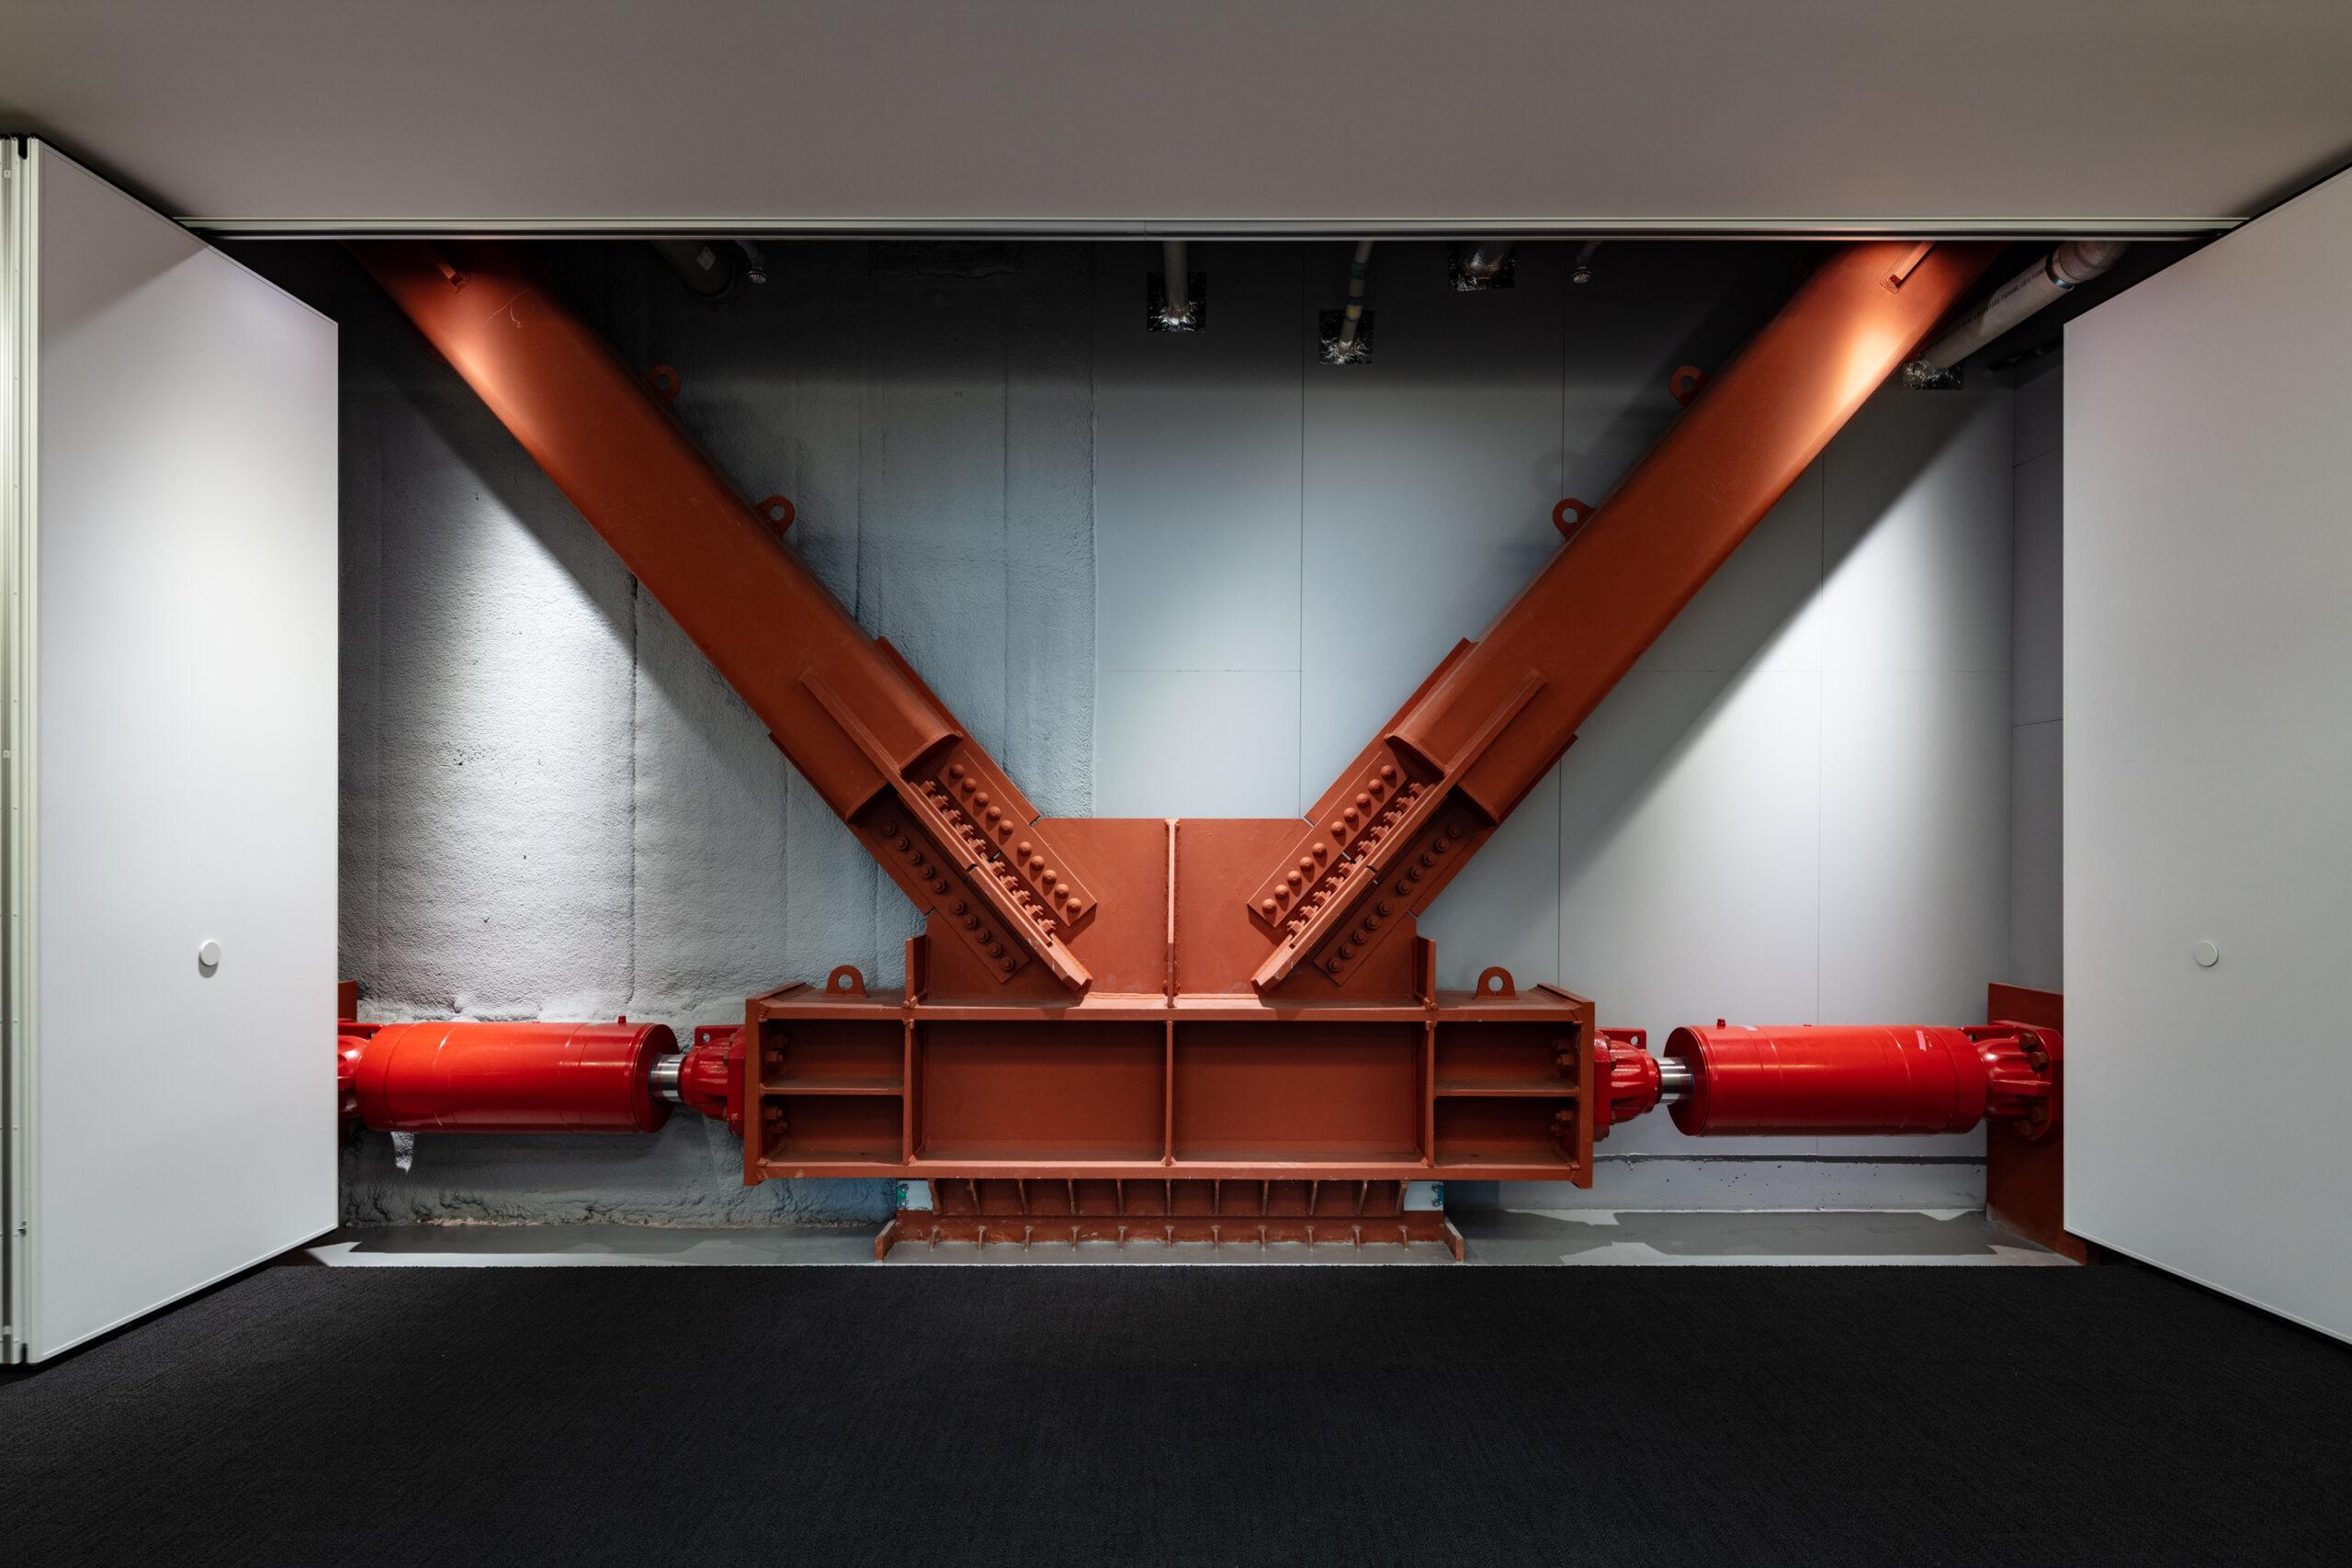 ingenhoven architects, Toranomon Project Tokyo, 2016-2020